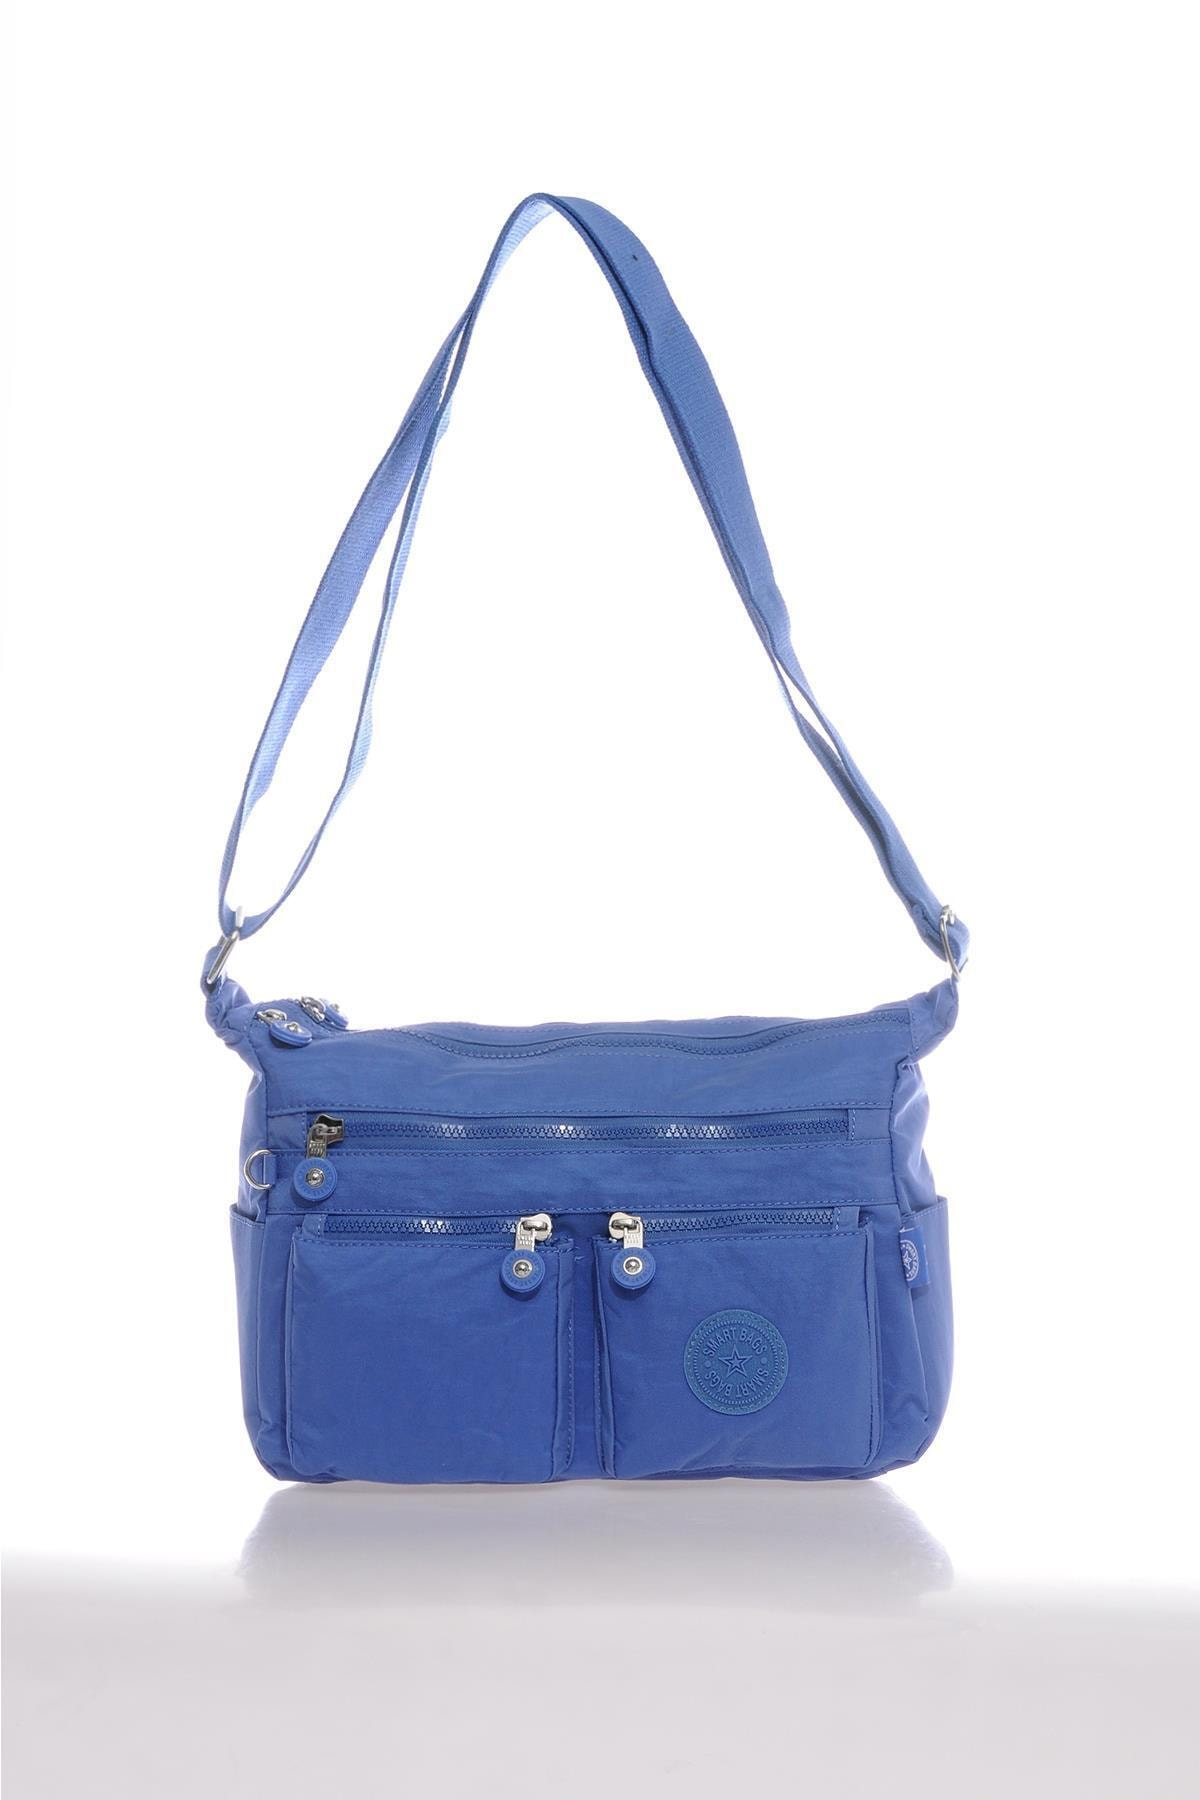 SMART BAGS Smb3065-0031 Mavi Kadın Çapraz Çanta 1